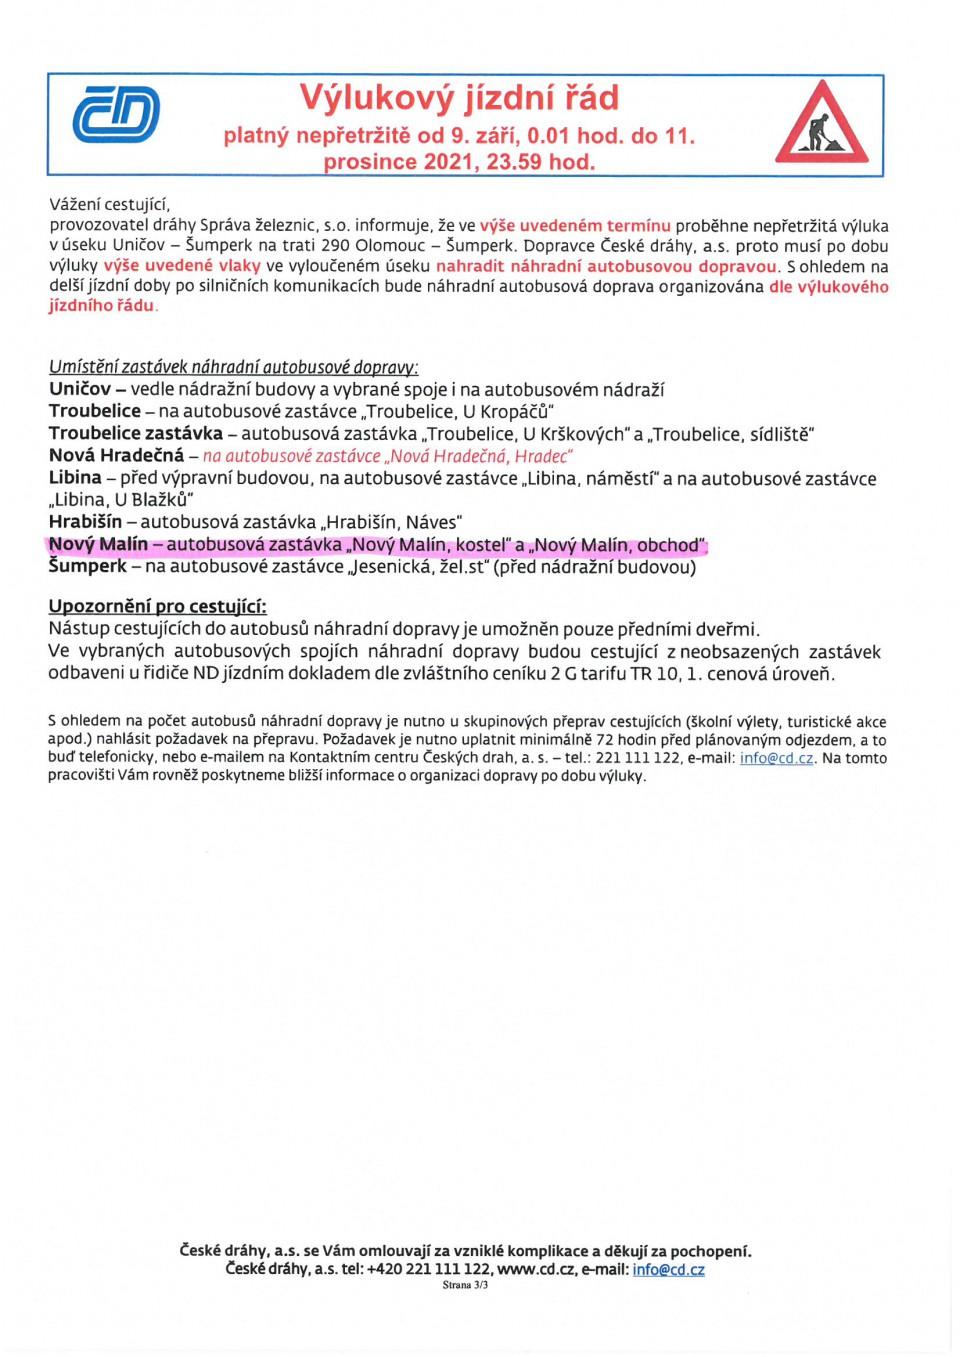 vylukovy-jizdni-rad-platny-od-9-zari-2021-do-11122021